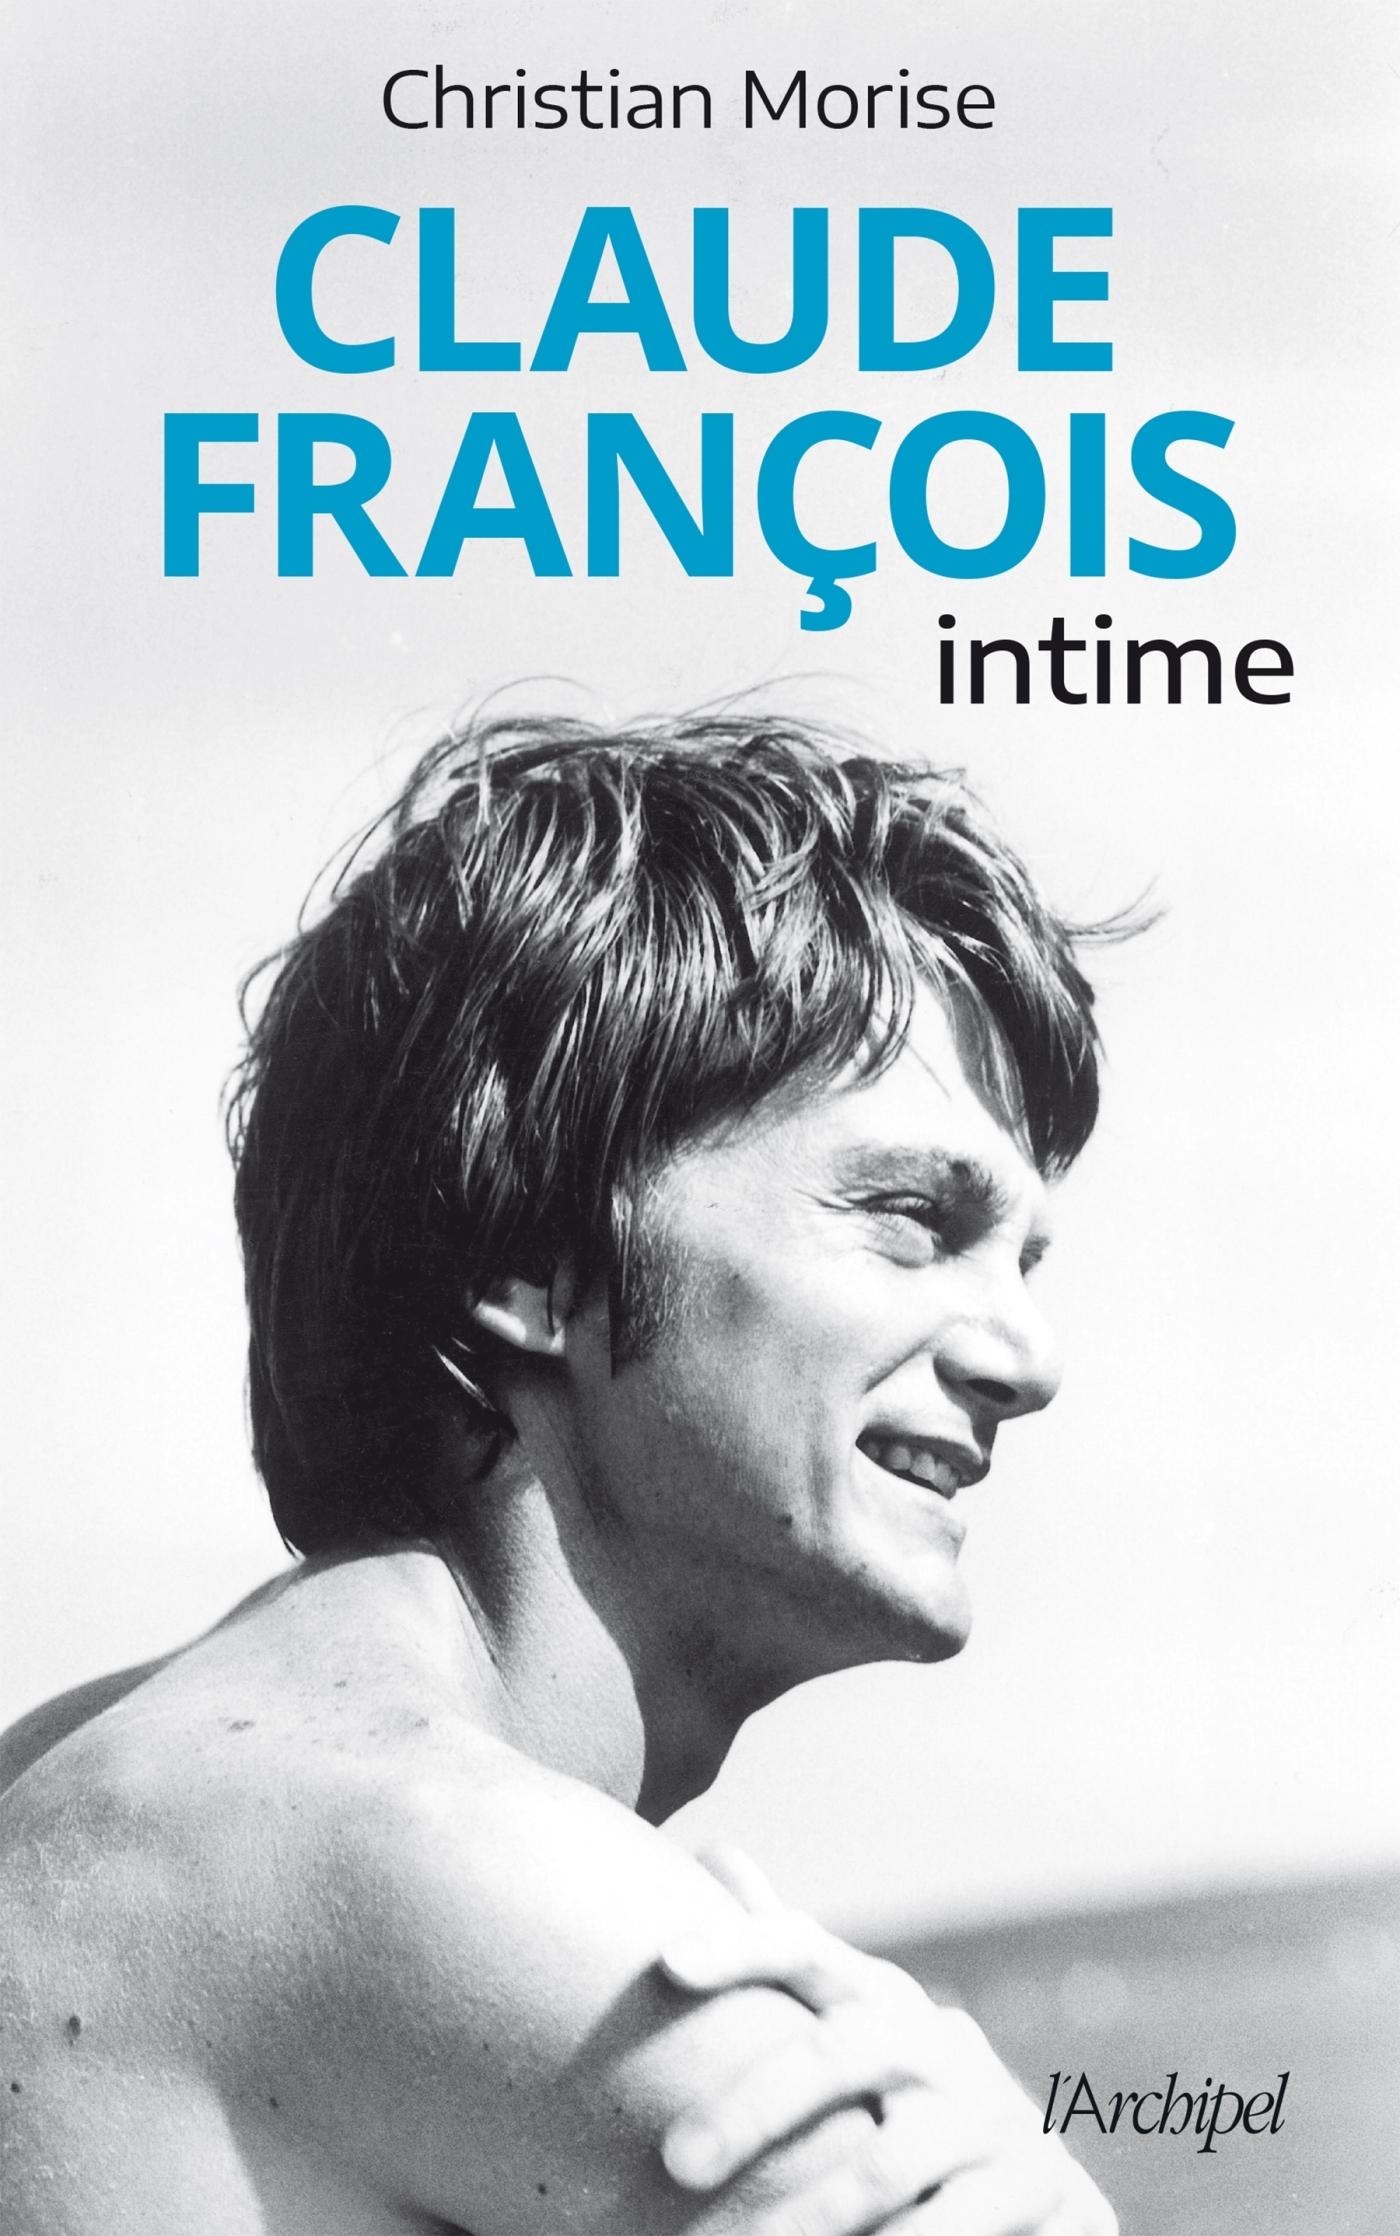 CLAUDE FRANCOIS INTIME